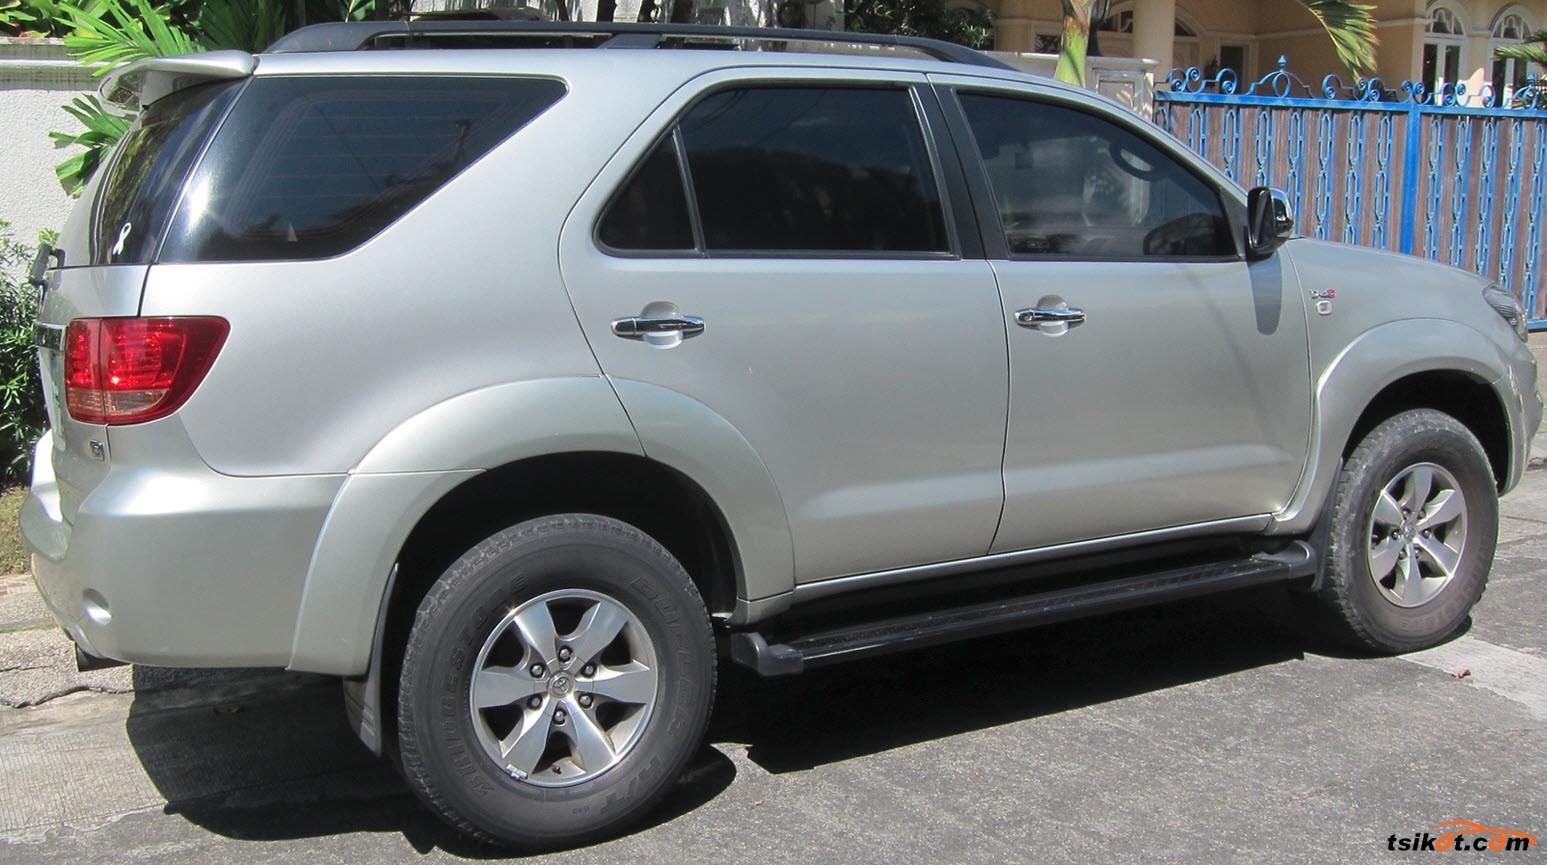 Suv Van For Sale In Quezon City 2018 Dodge Reviews